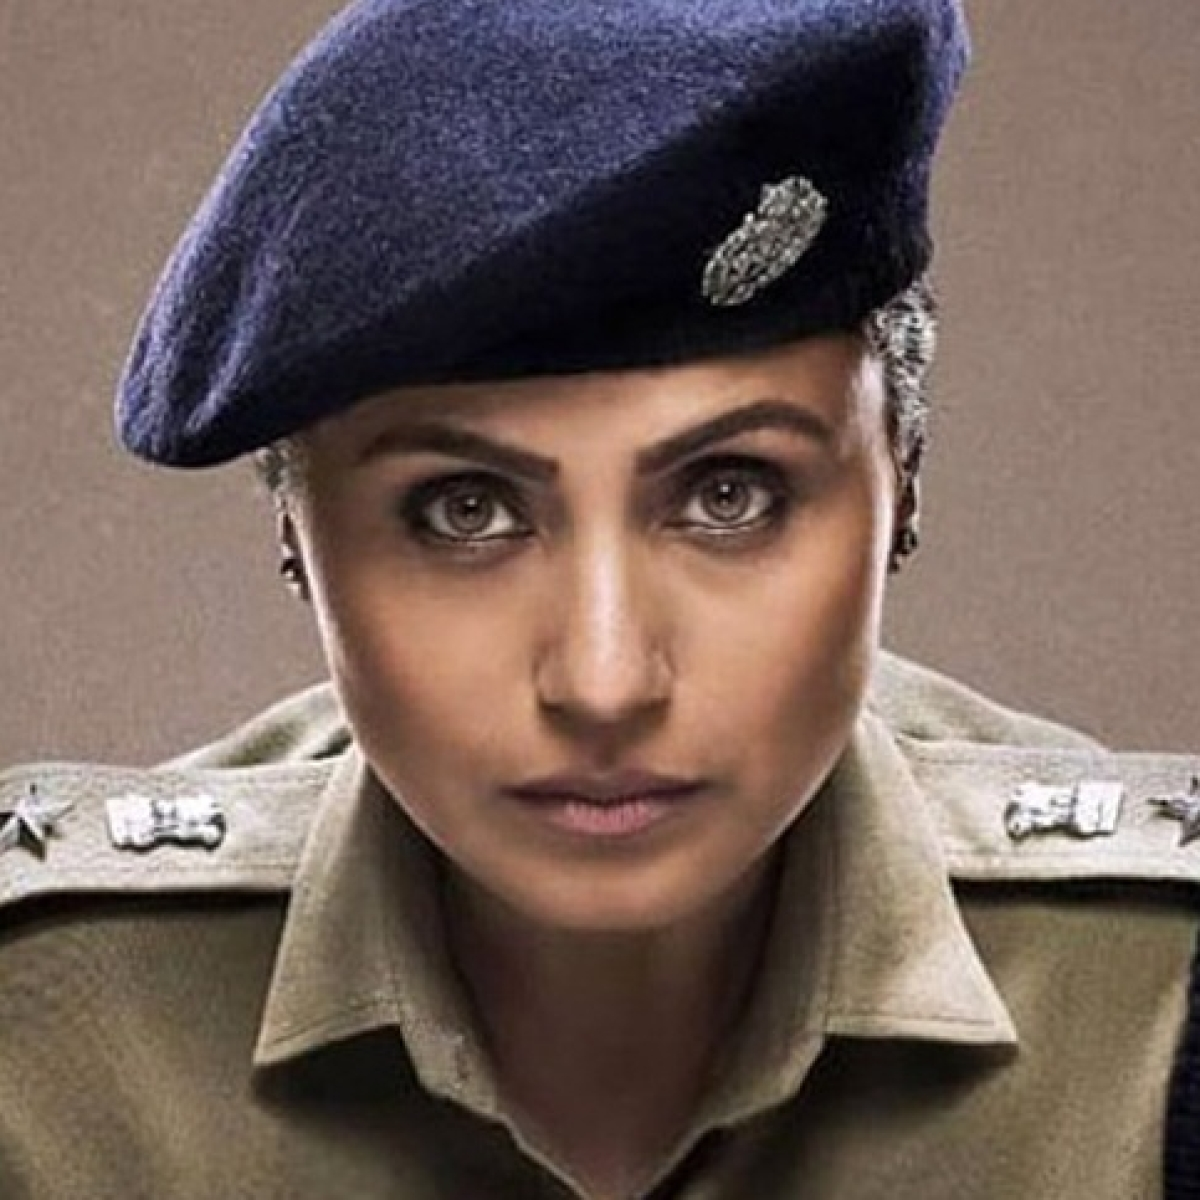 'Mardaani 2' will teach men 'where is the limit': Rani Mukerji